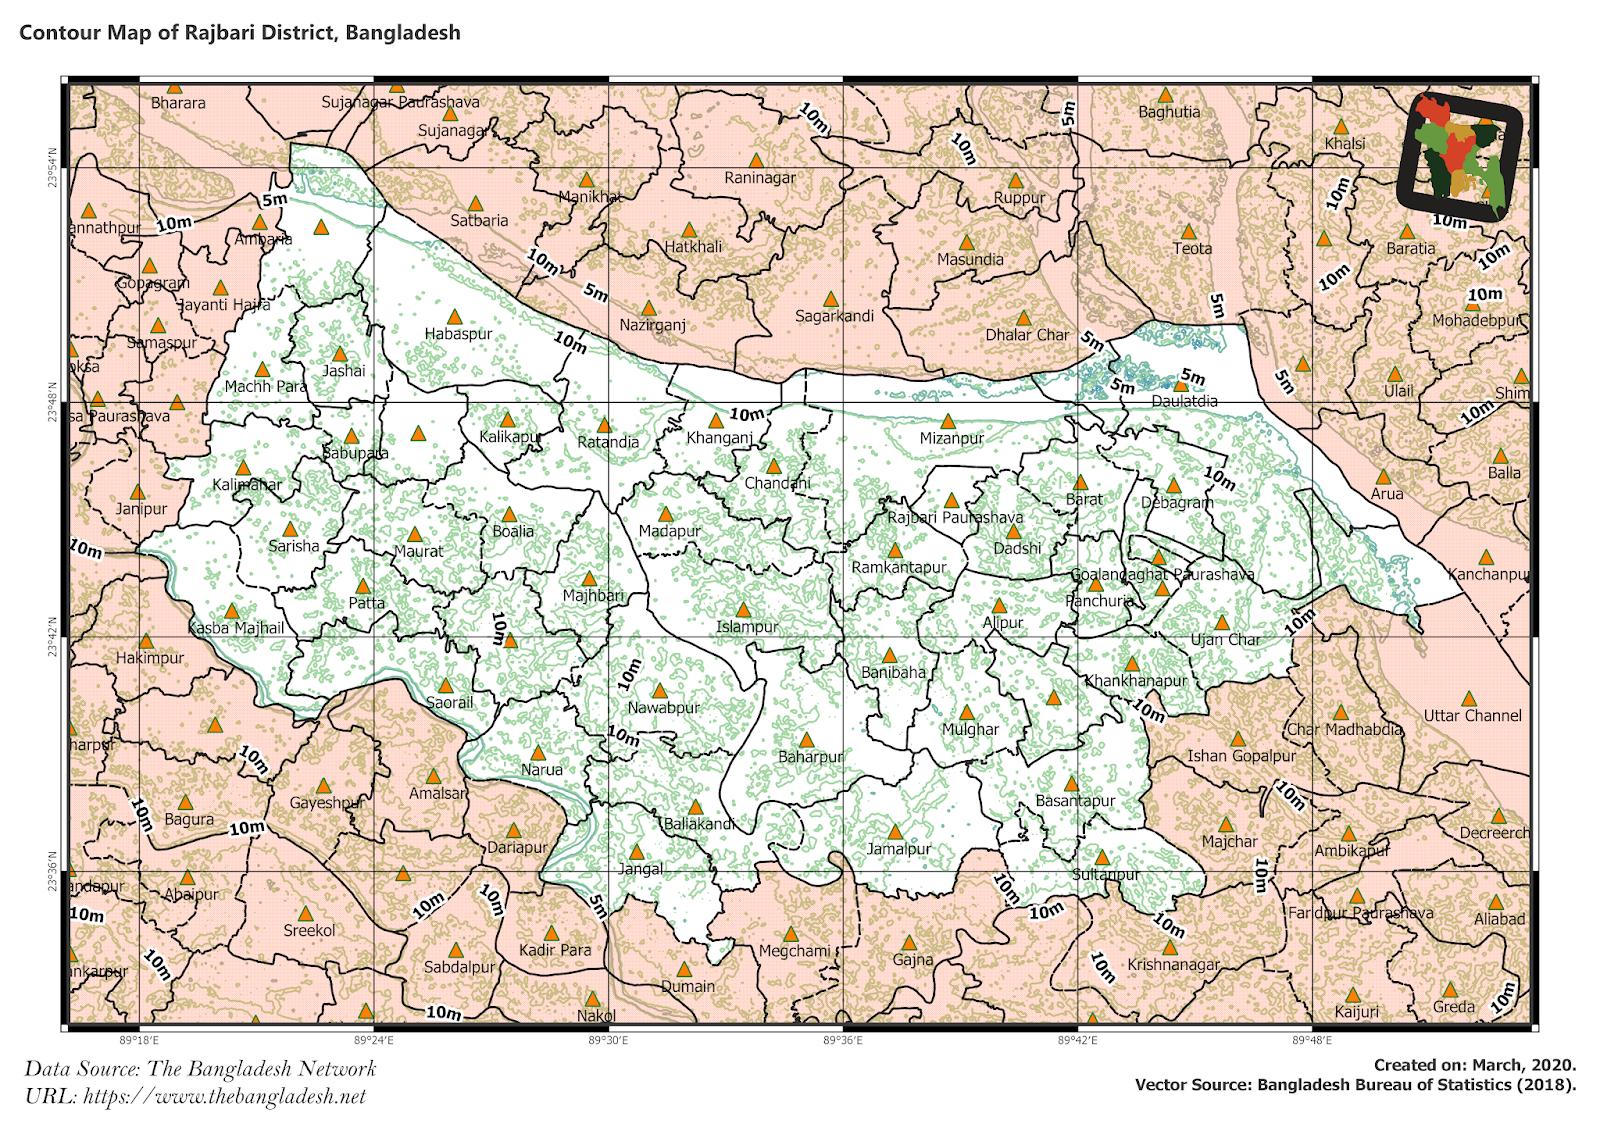 Elevation Map of Rajbari District of Bangladesh